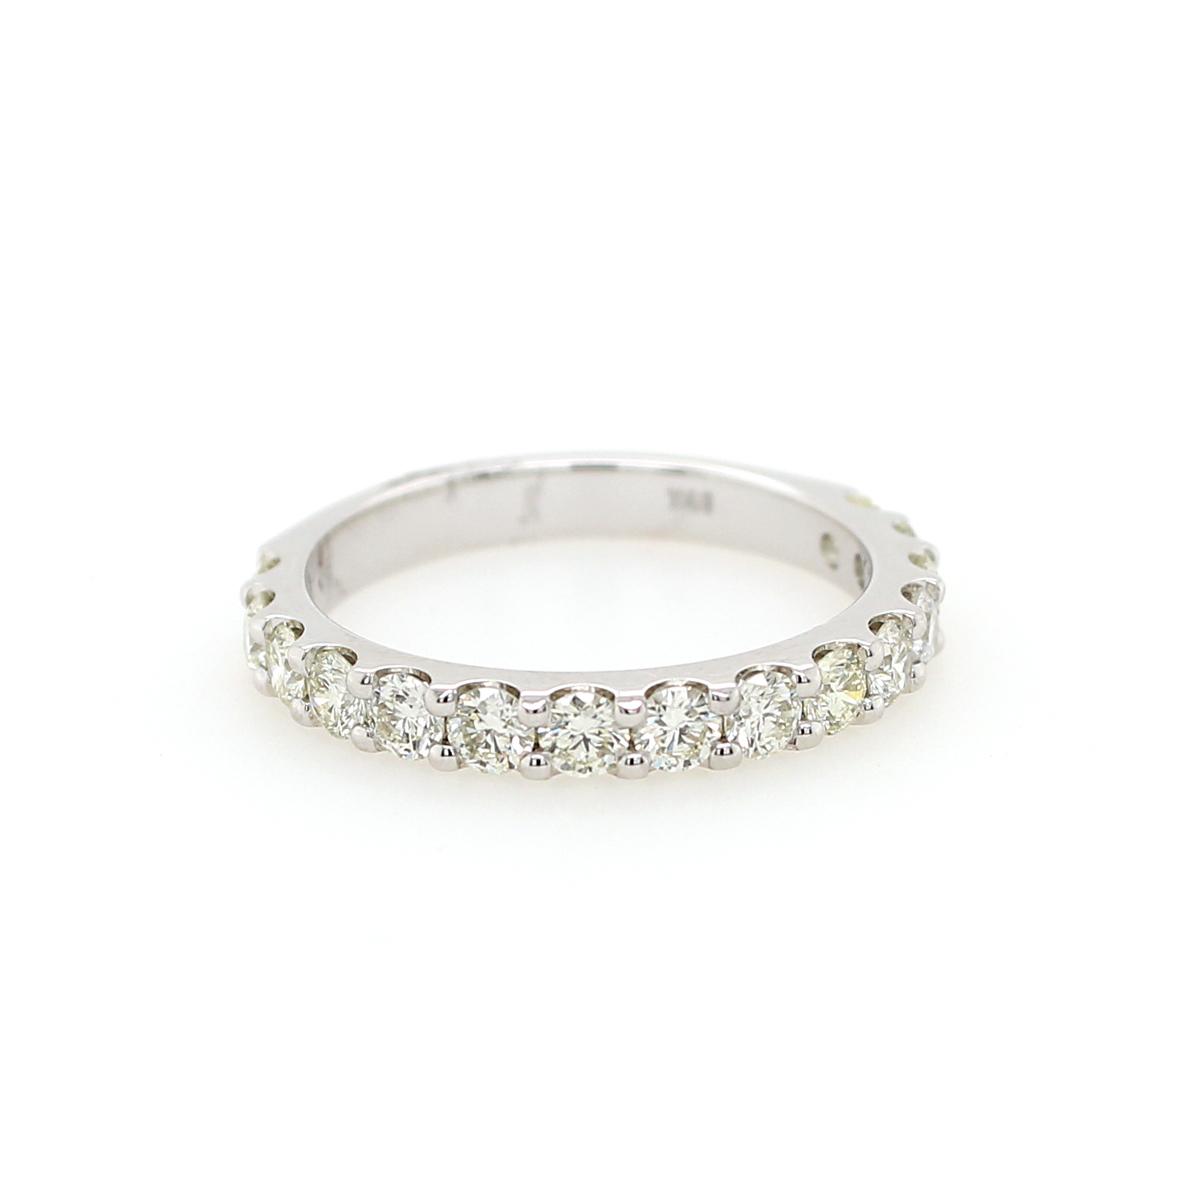 Shefi Diamonds 14 Karat White Gold 1 Carat Wedding Band